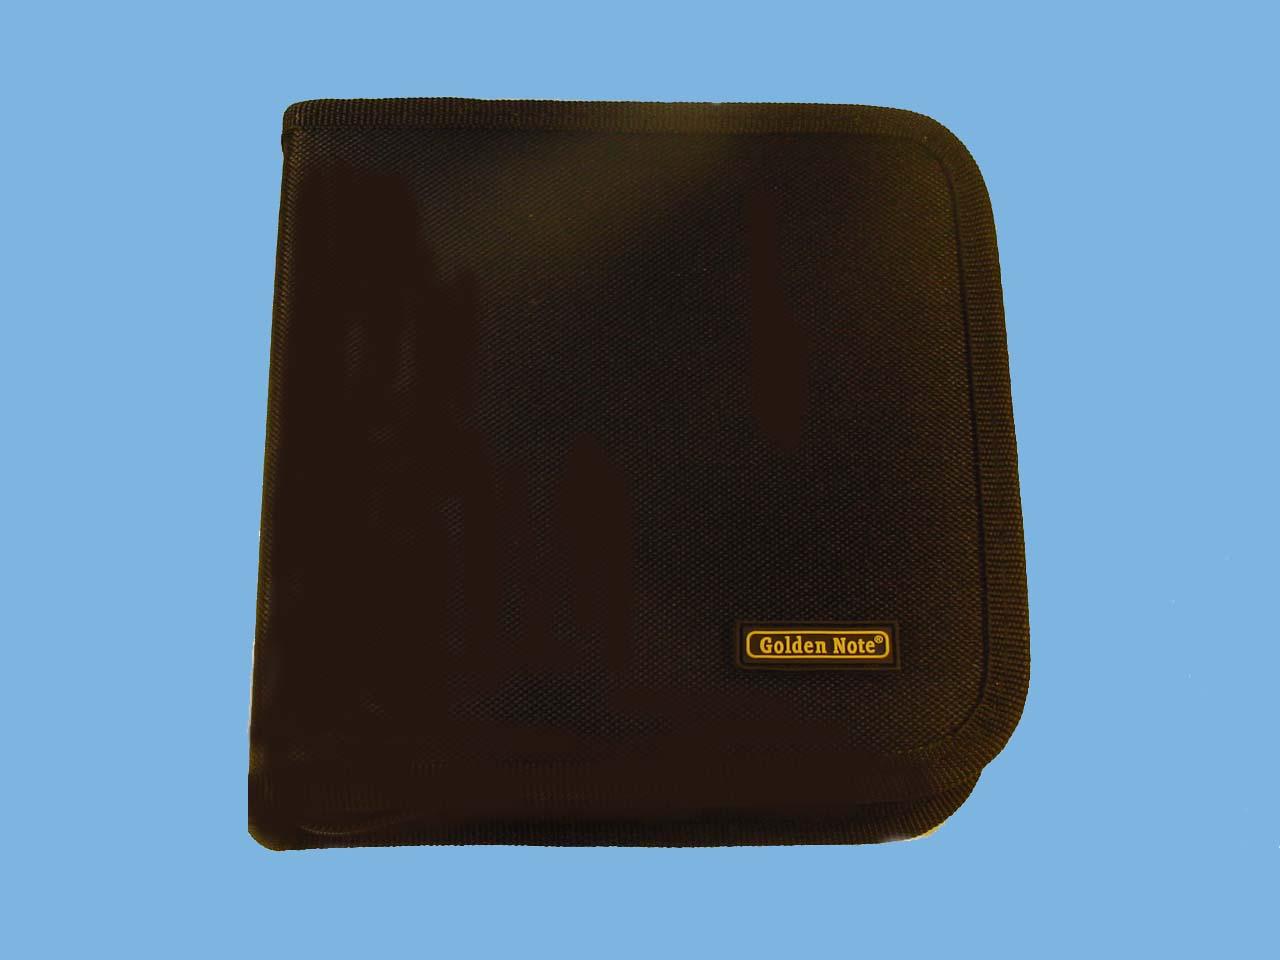 CD wallet 24 cd's